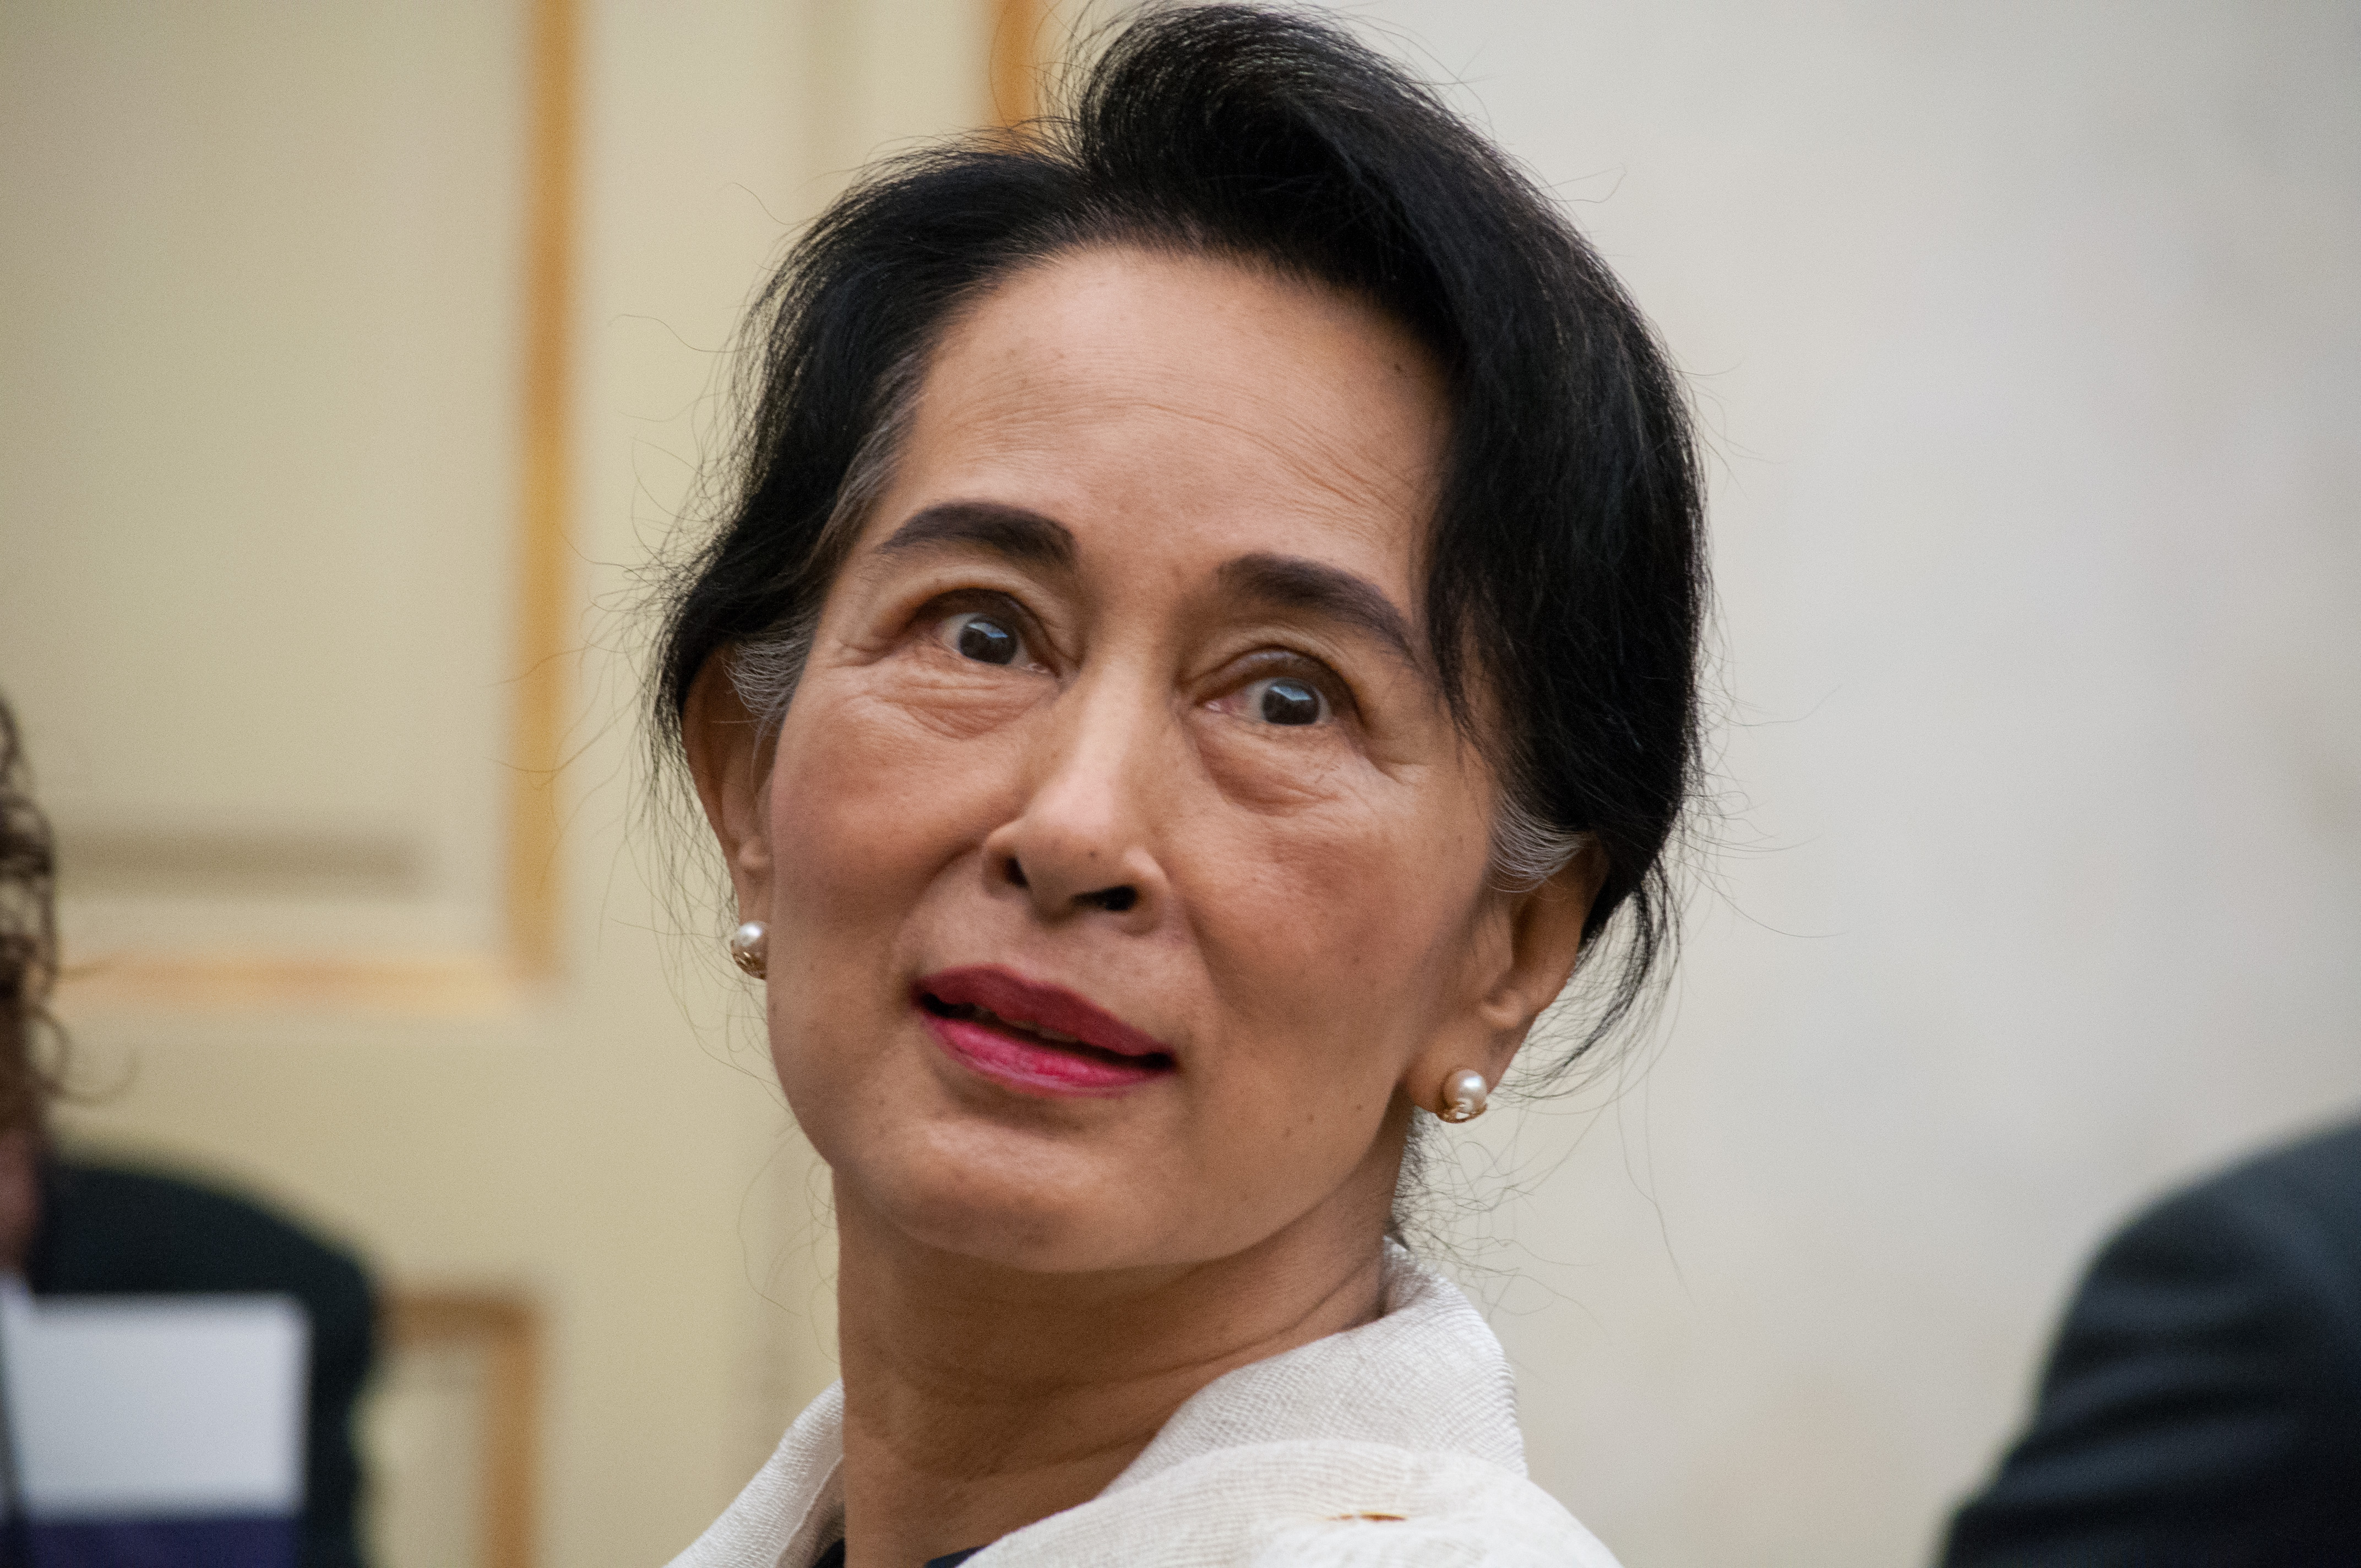 Poet Aung San Suu Kyi